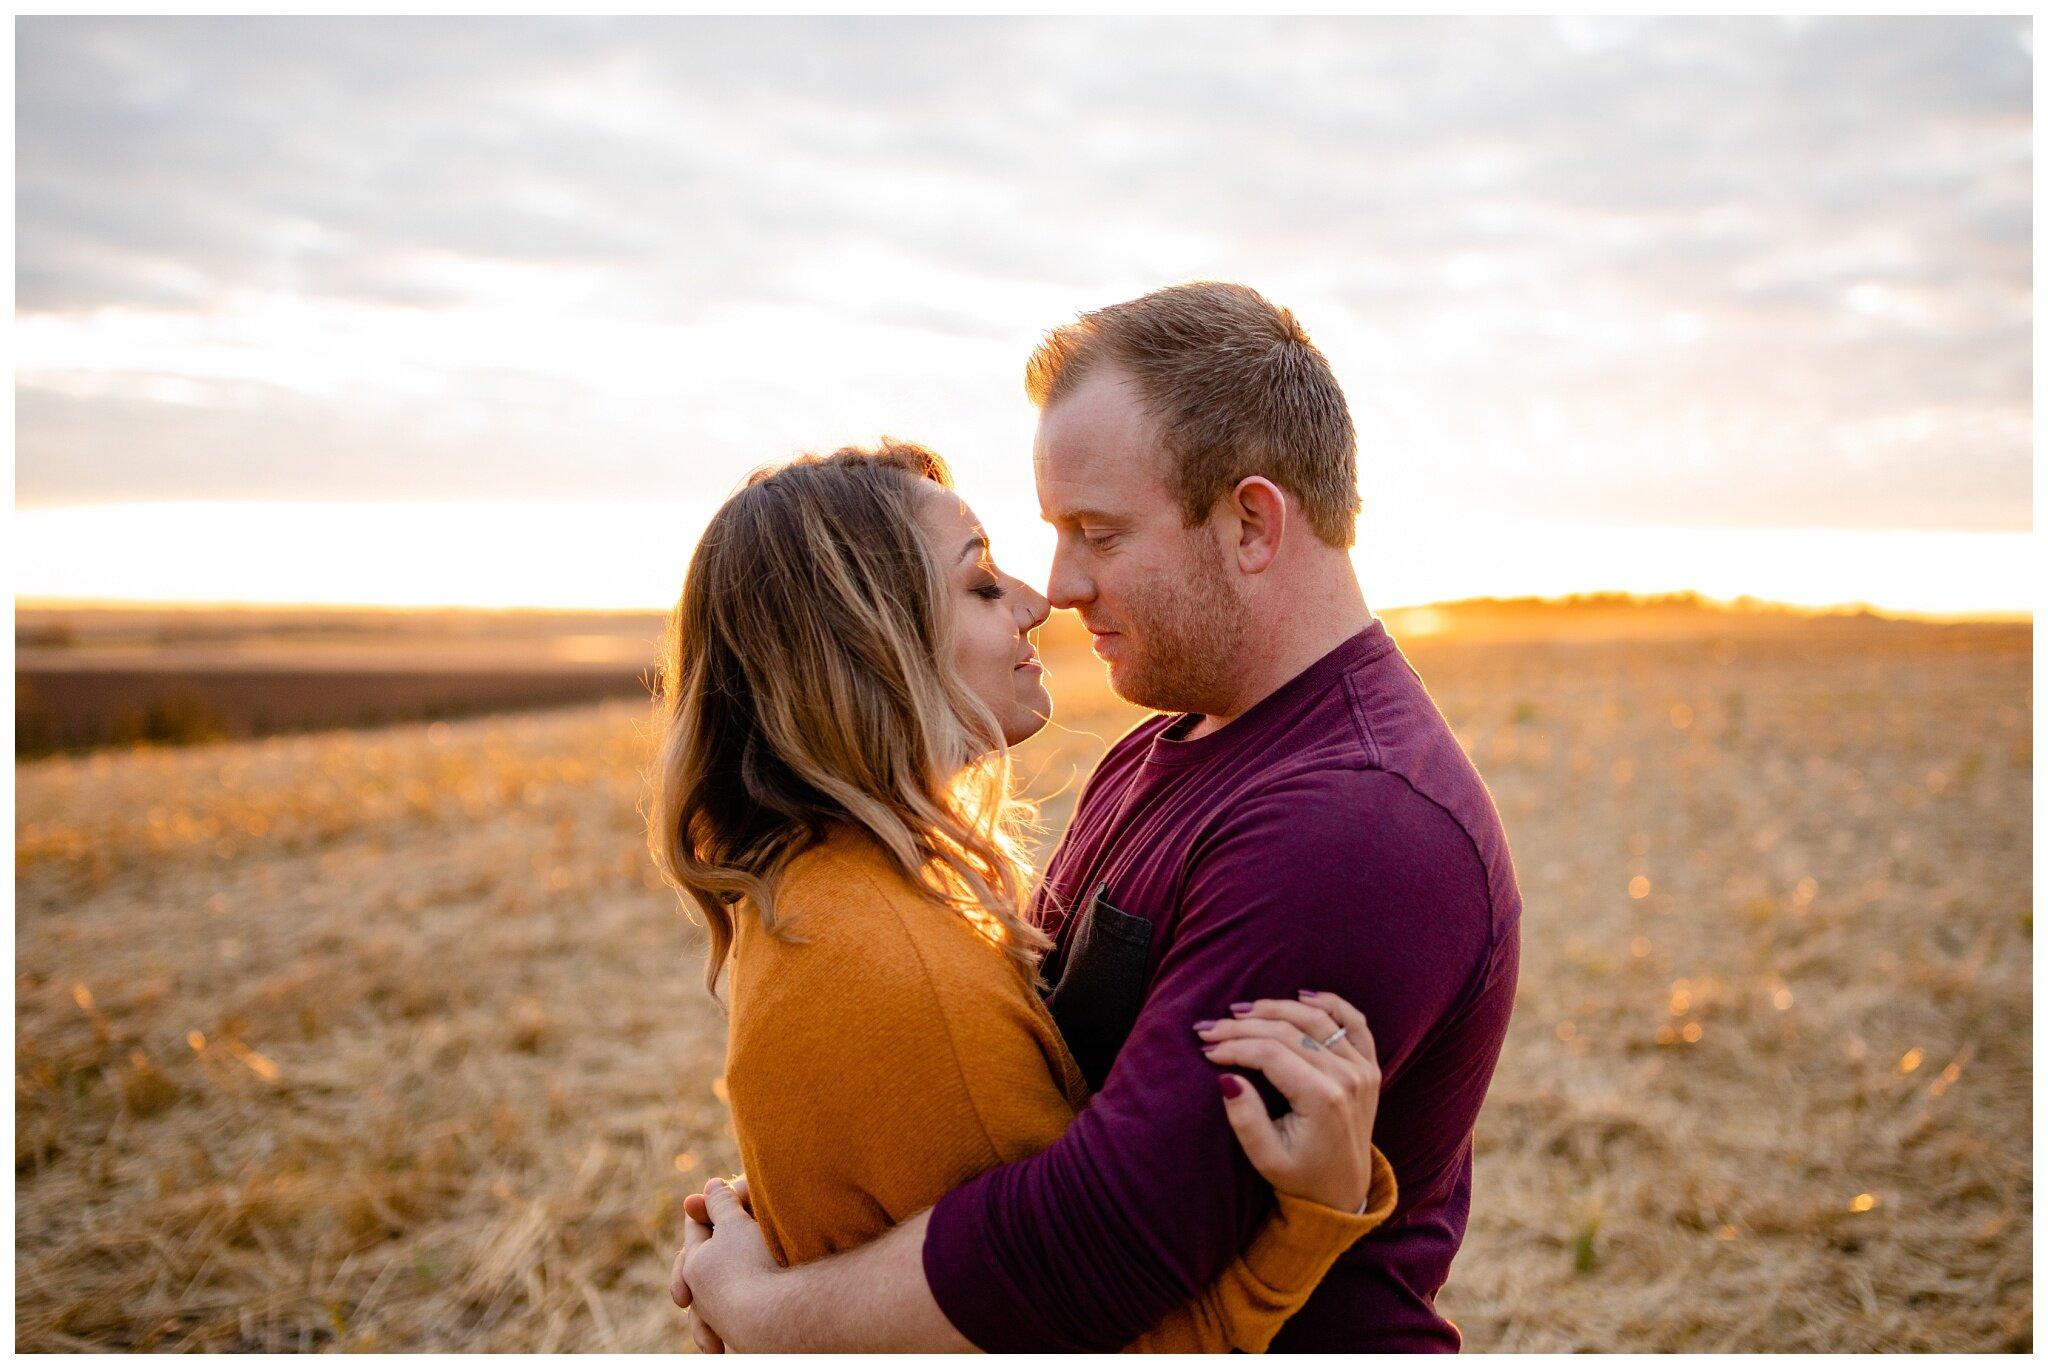 Edmonton Engagement Photographer Romantic Couples Photos Local YEG Strathcona County_0018.jpg